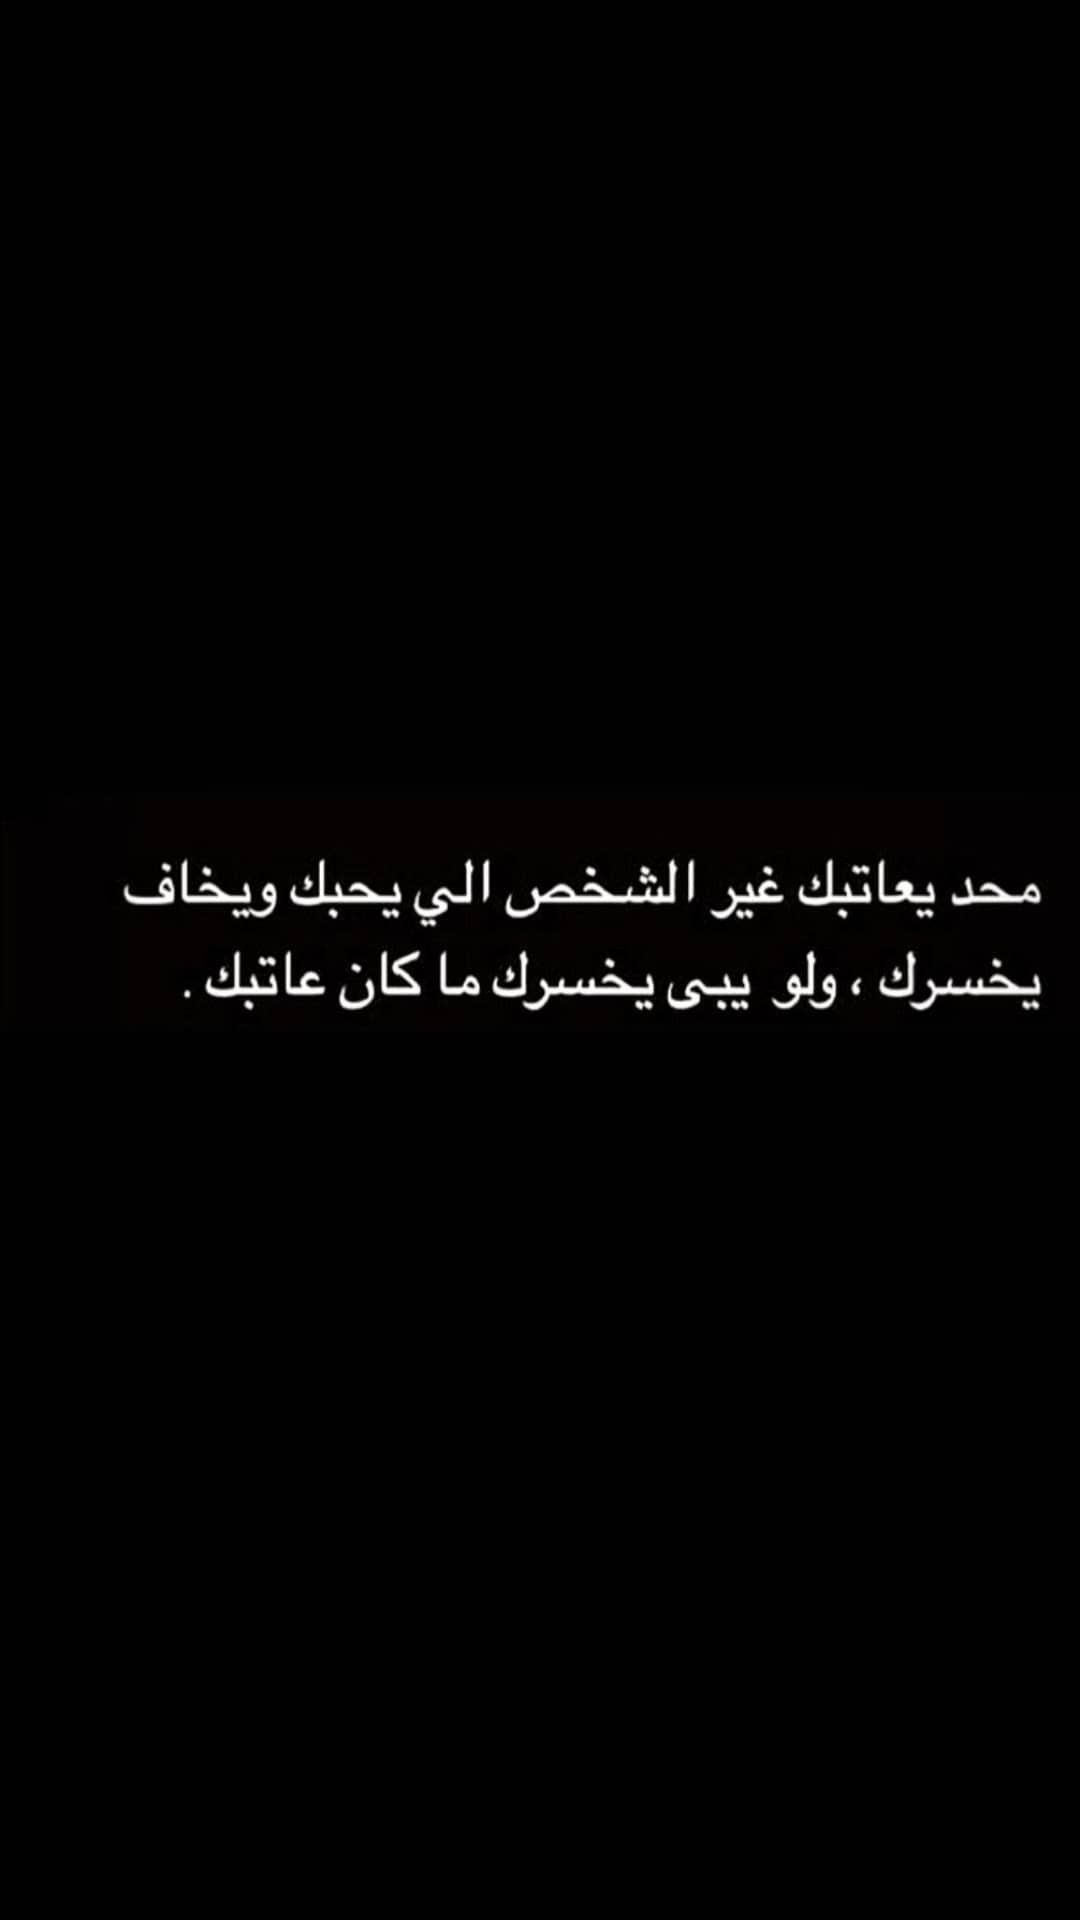 Pin By Danoo Haederr On Dano Wisdom Quotes Life Love Smile Quotes Funny Arabic Quotes